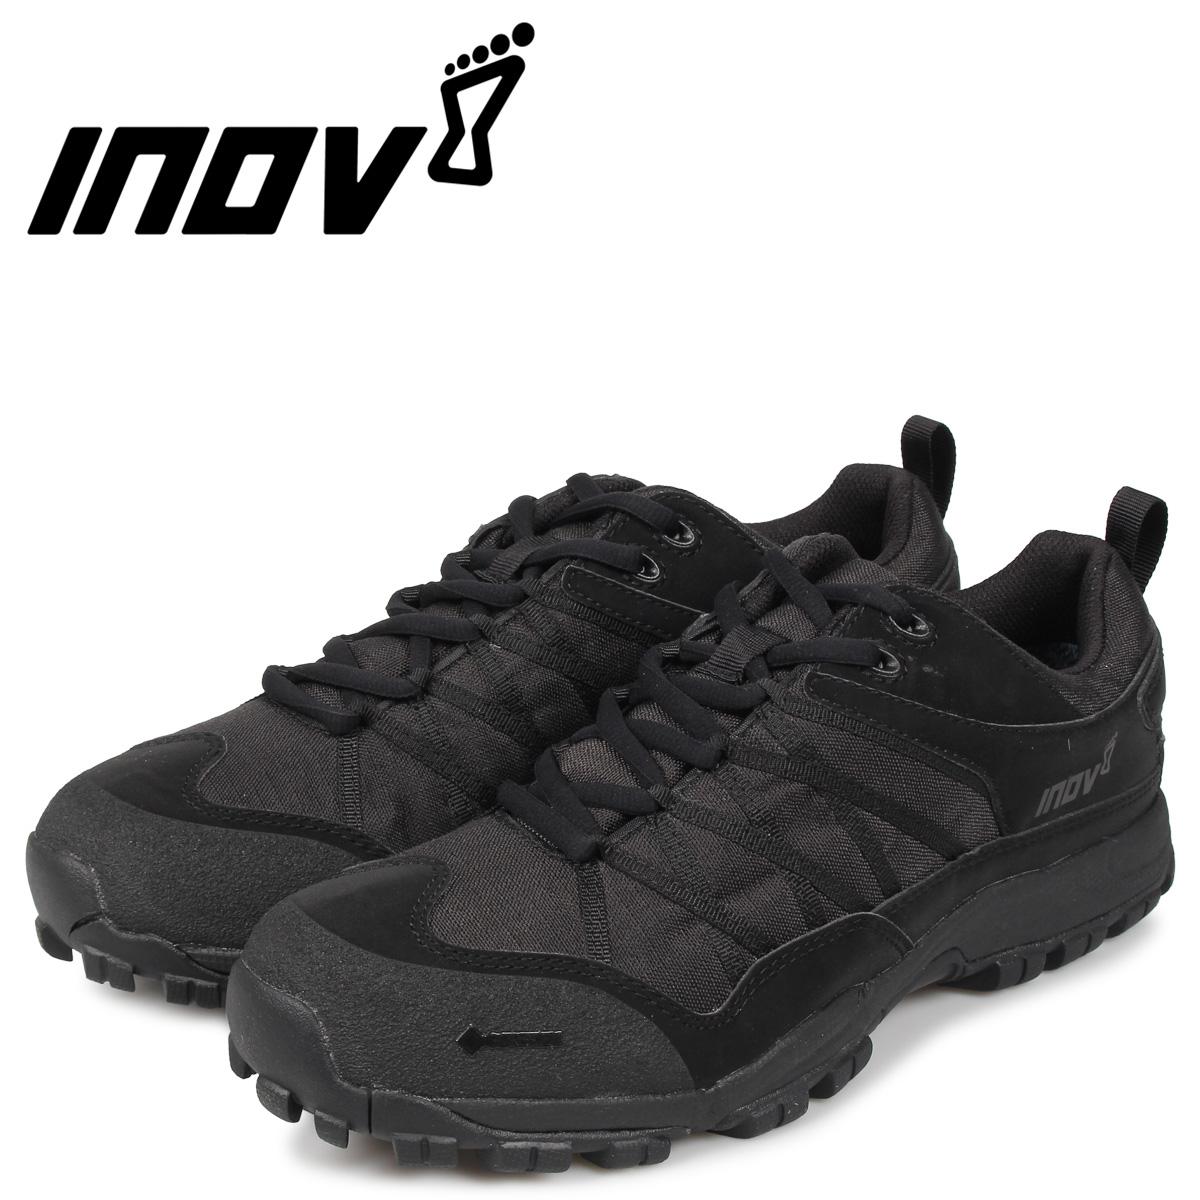 inov-8 イノヴェイト フライロック シューズ トレイルランニングシューズ メンズ FLYROC 345 GTX CD UN ブラック 黒 NO1OGG19BK